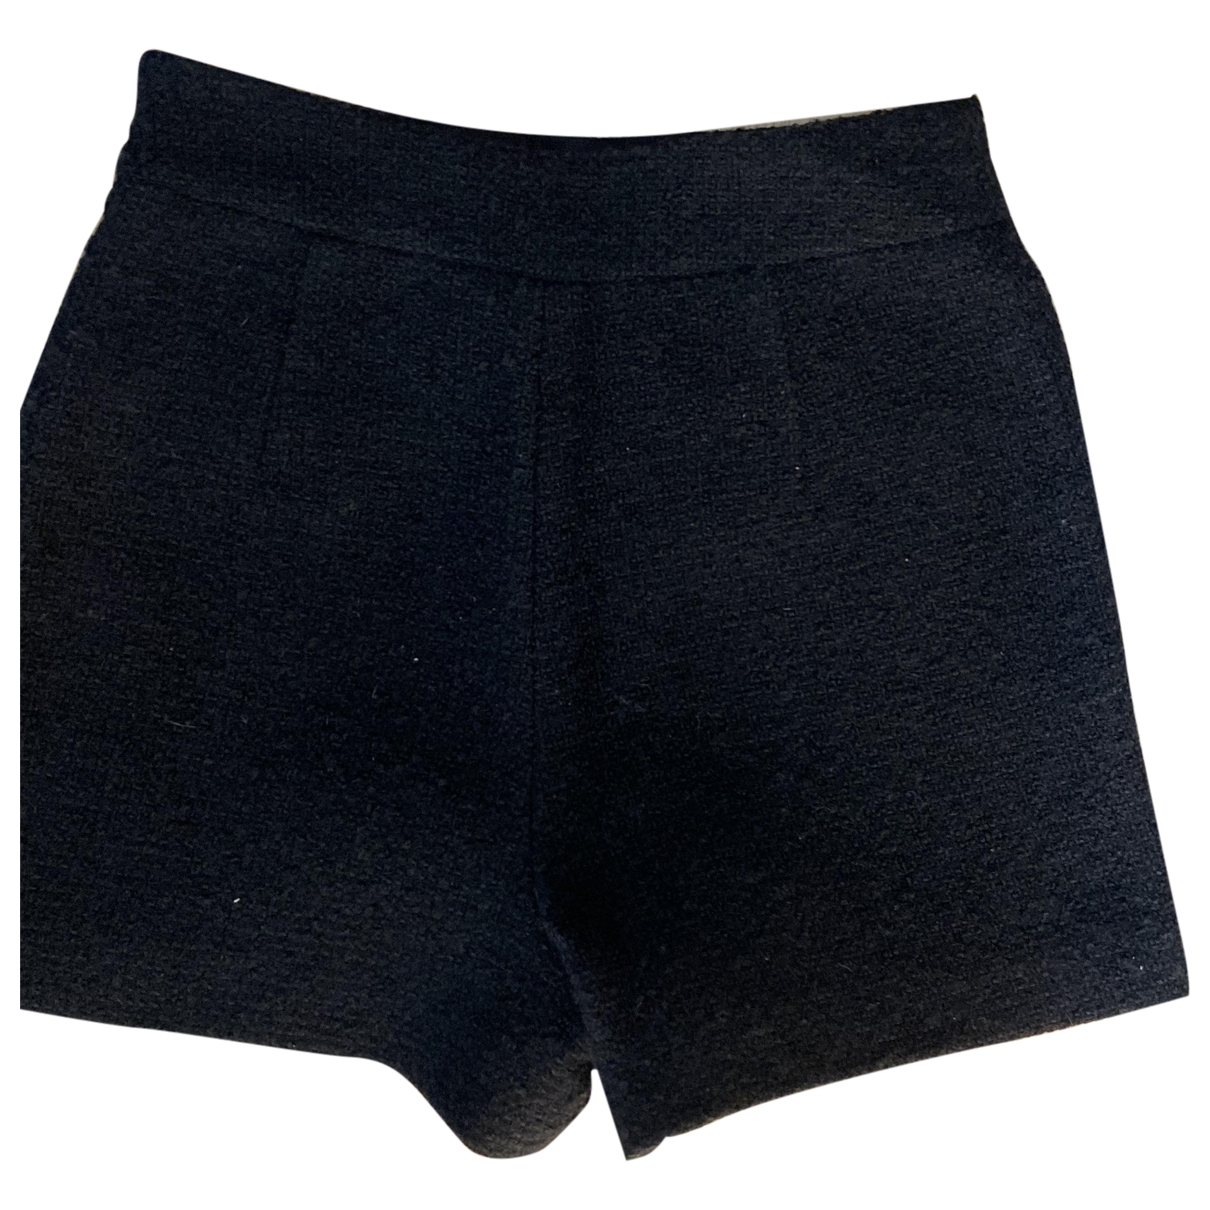 Maje Fall Winter 2019 Black Wool Shorts for Women 36 FR